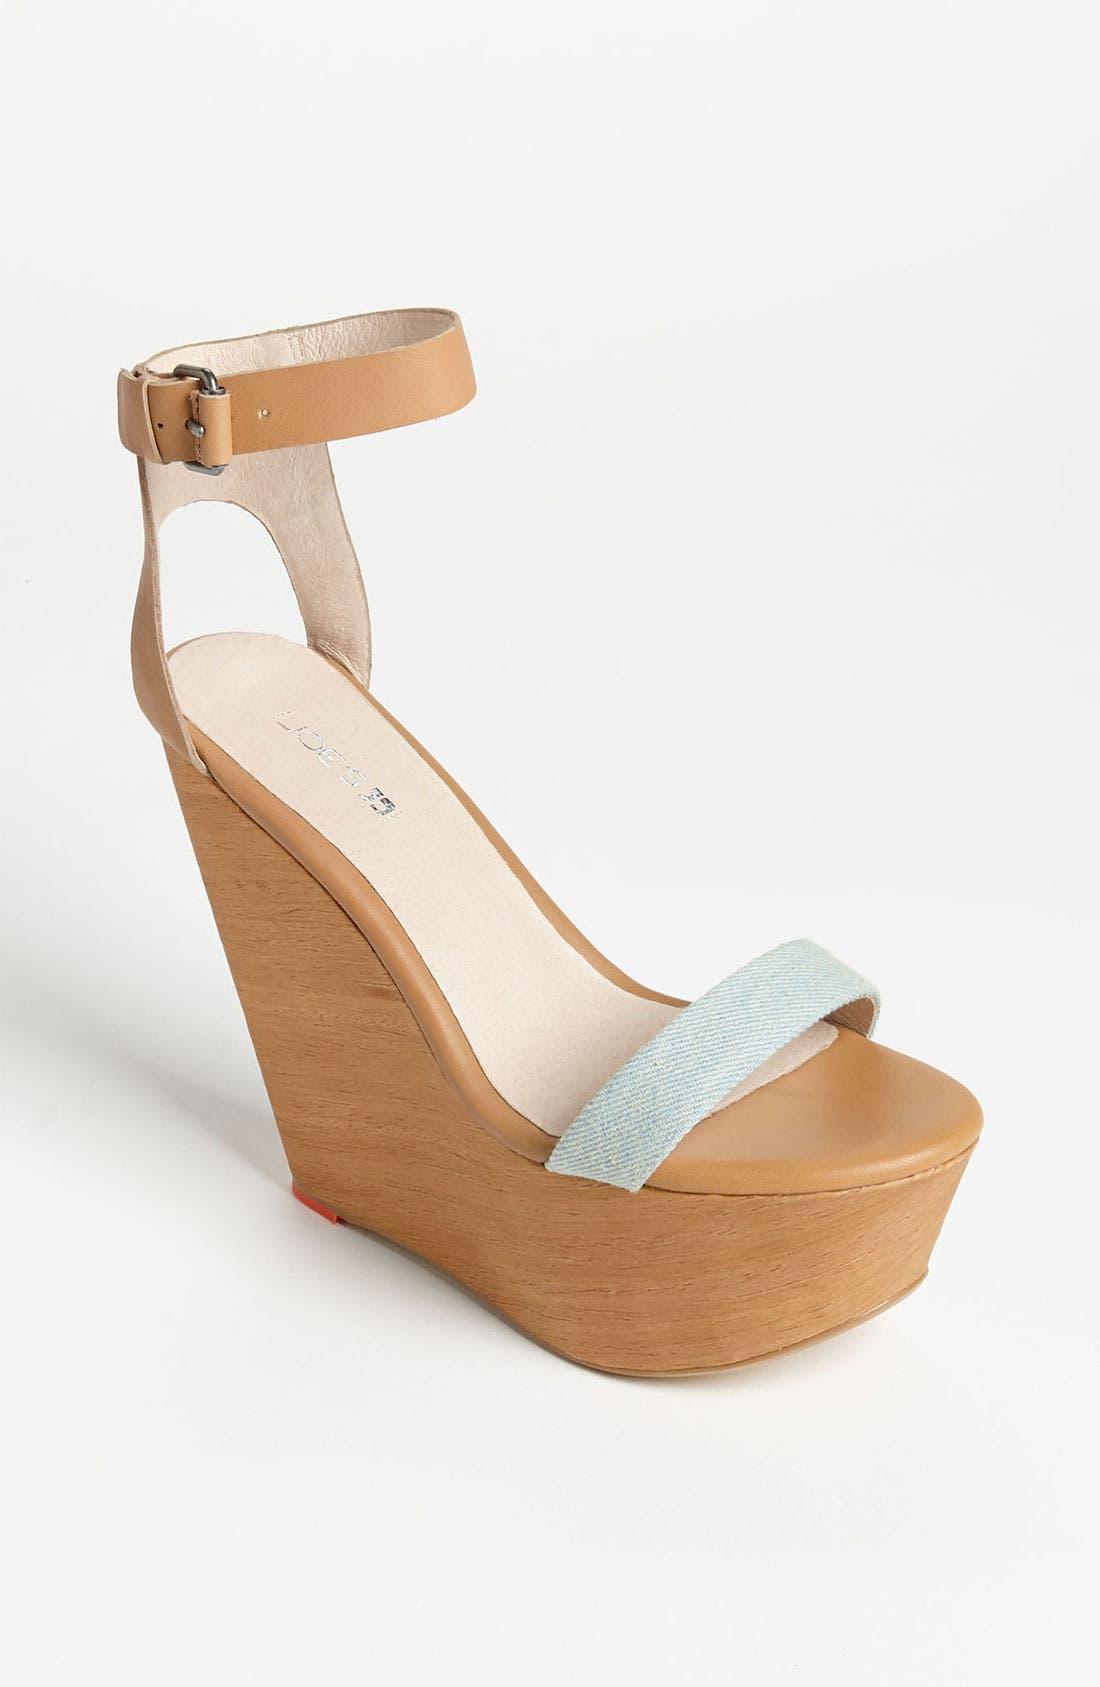 Main Image - Joe's Wedge Sandal